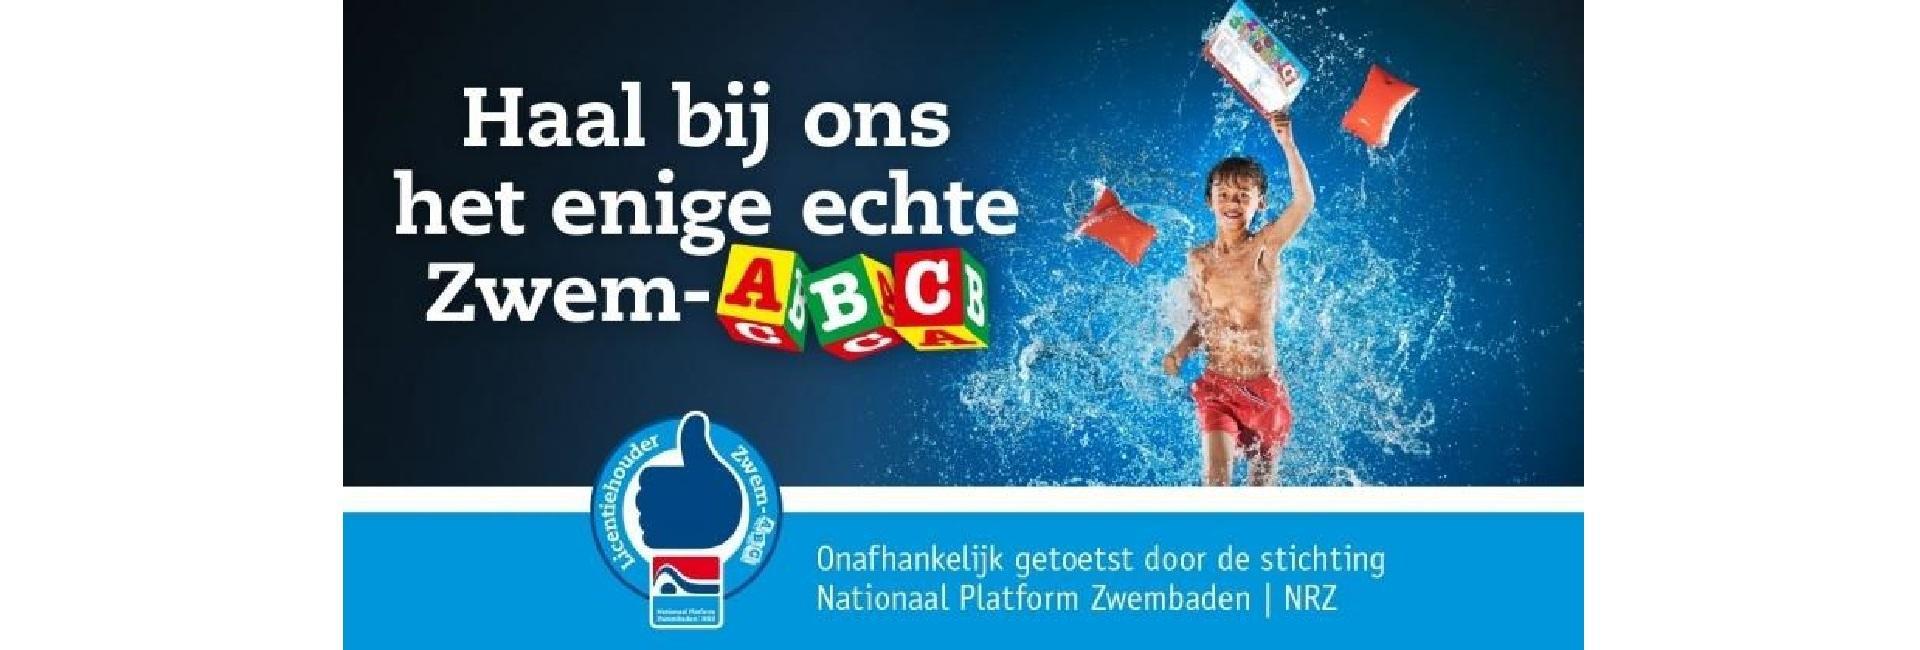 zwemles diploma zwemmen ABC